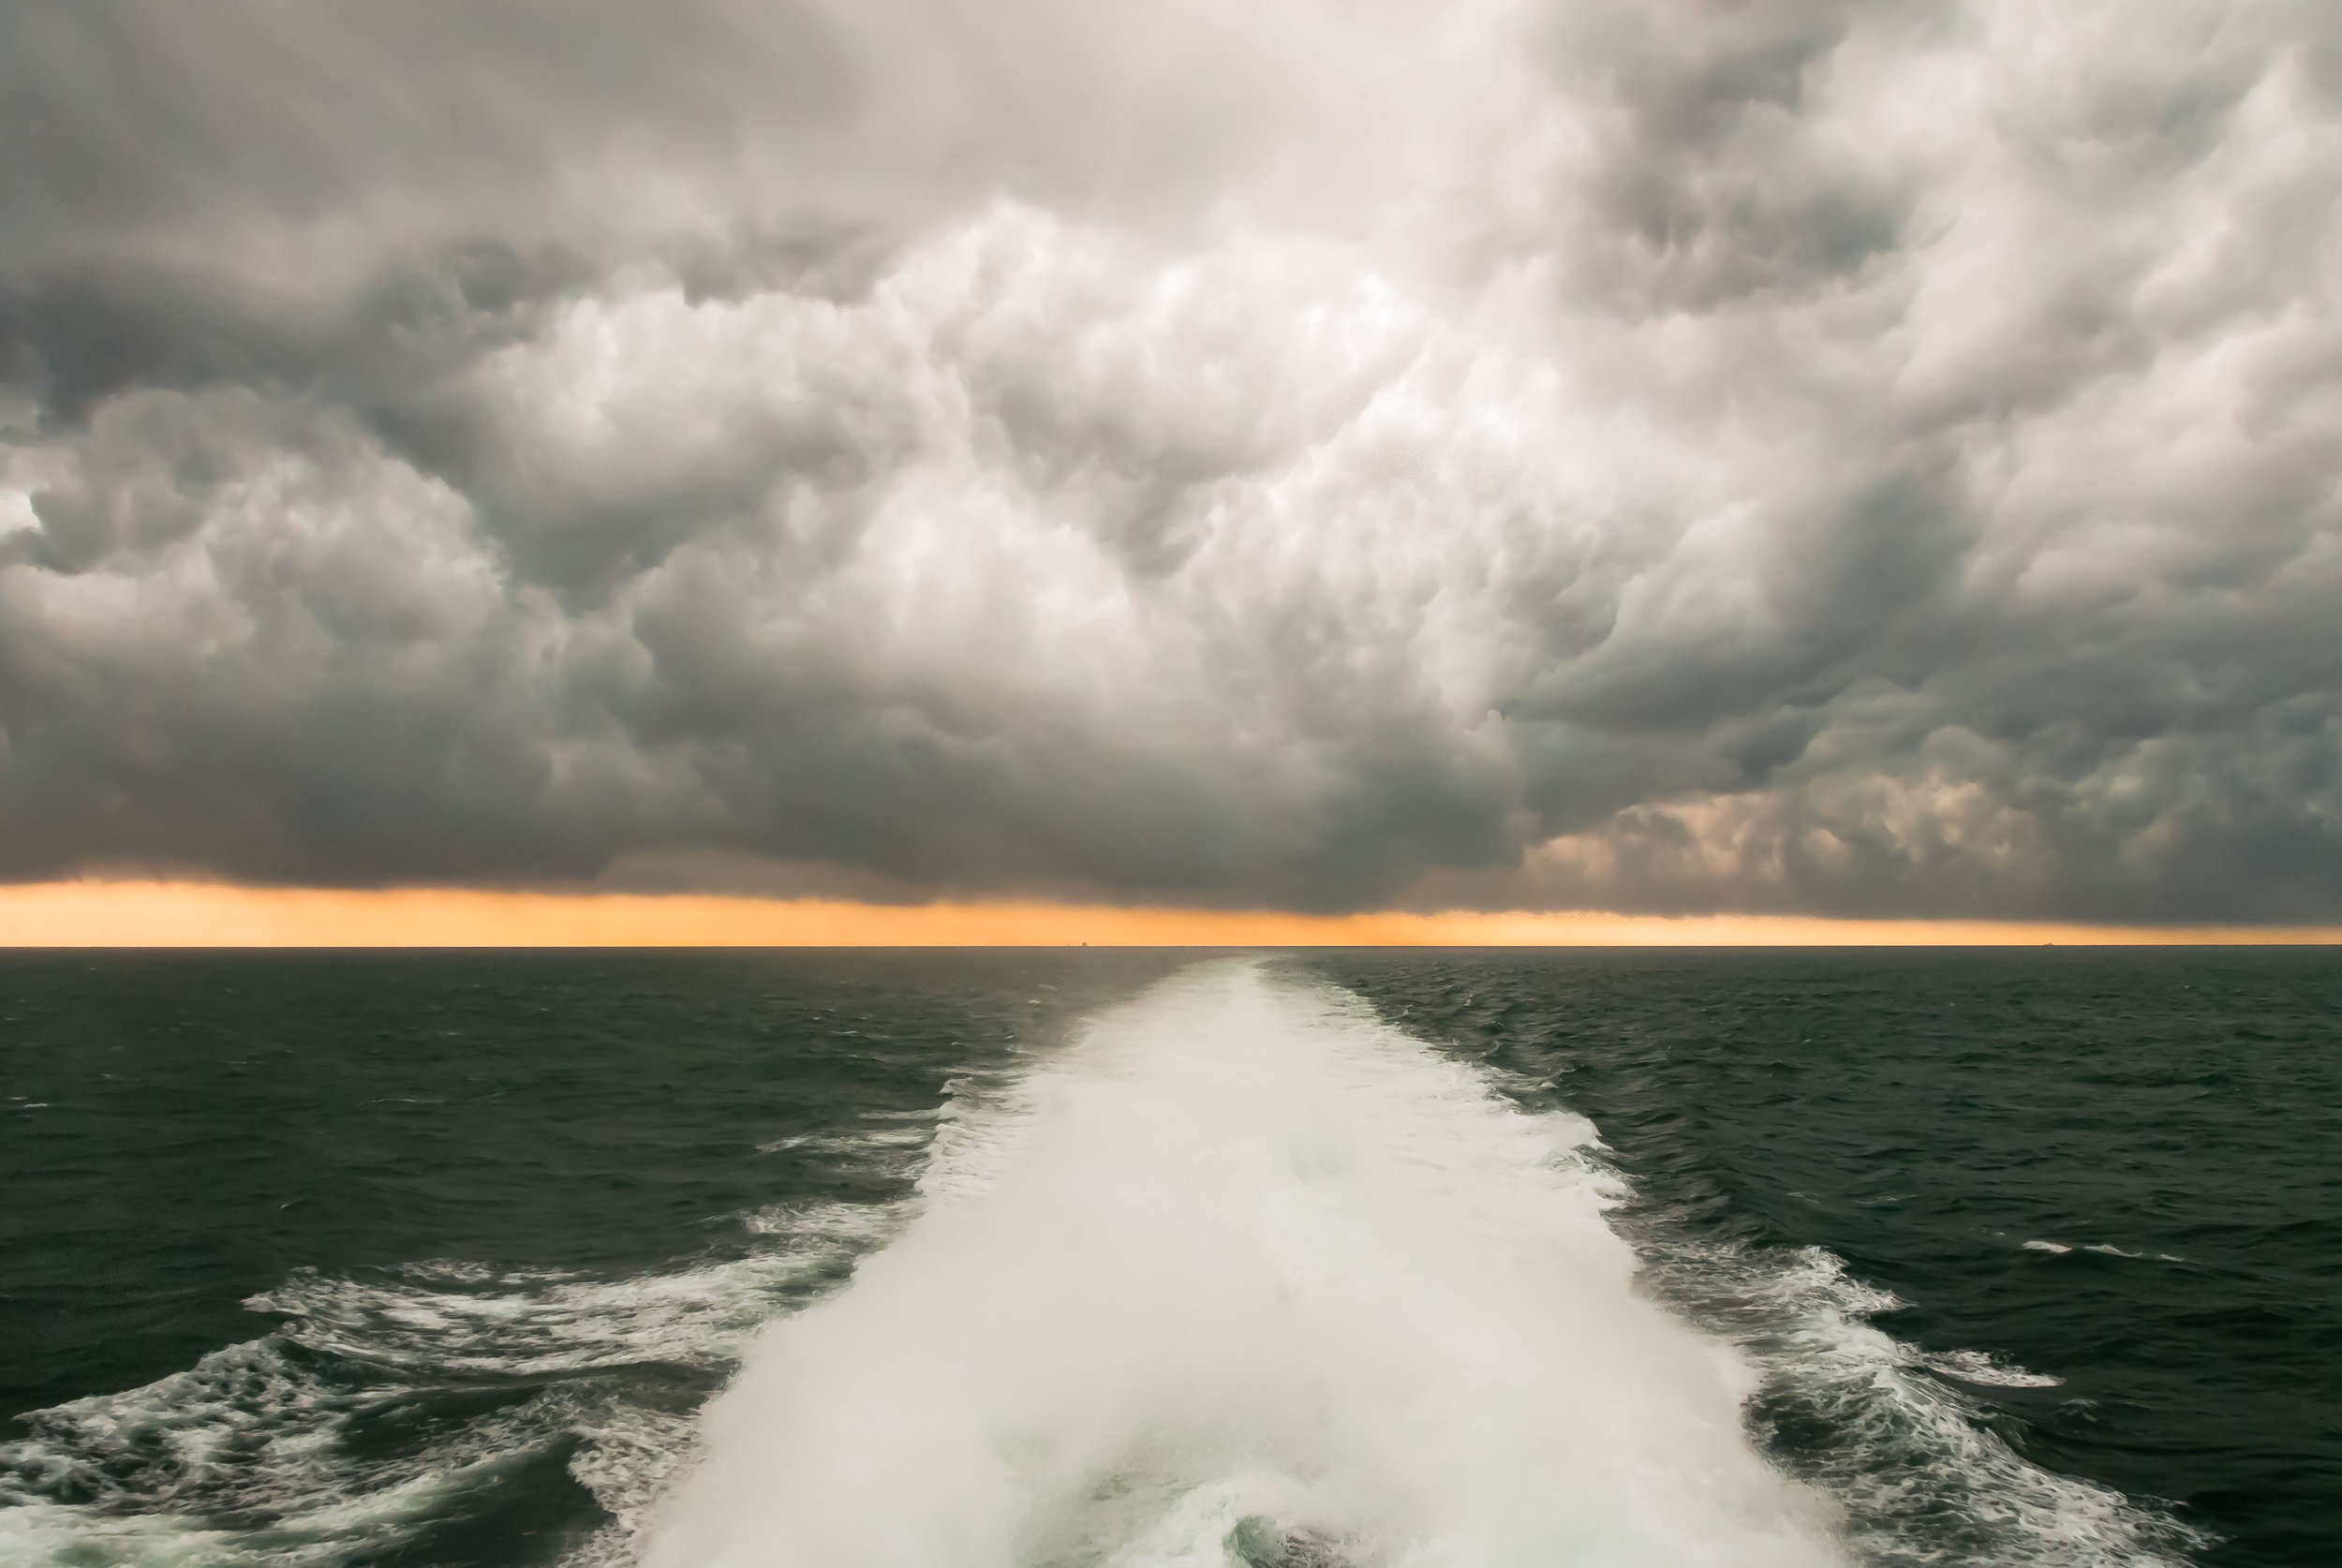 boat storm copy.jpg